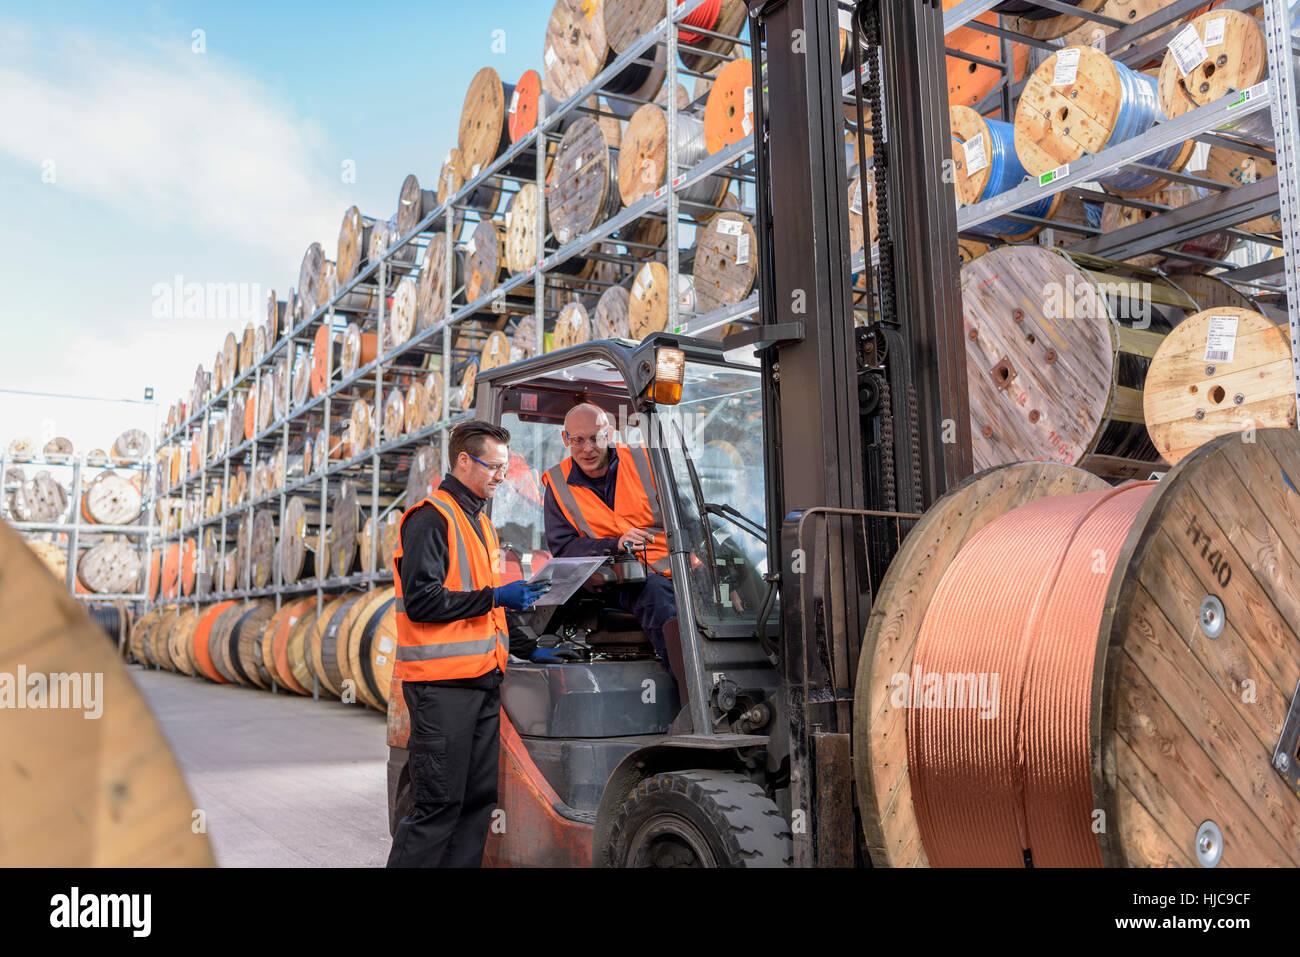 Arbeitnehmer mit Gabel Stapler Kabel Lagerhaus Stockbild